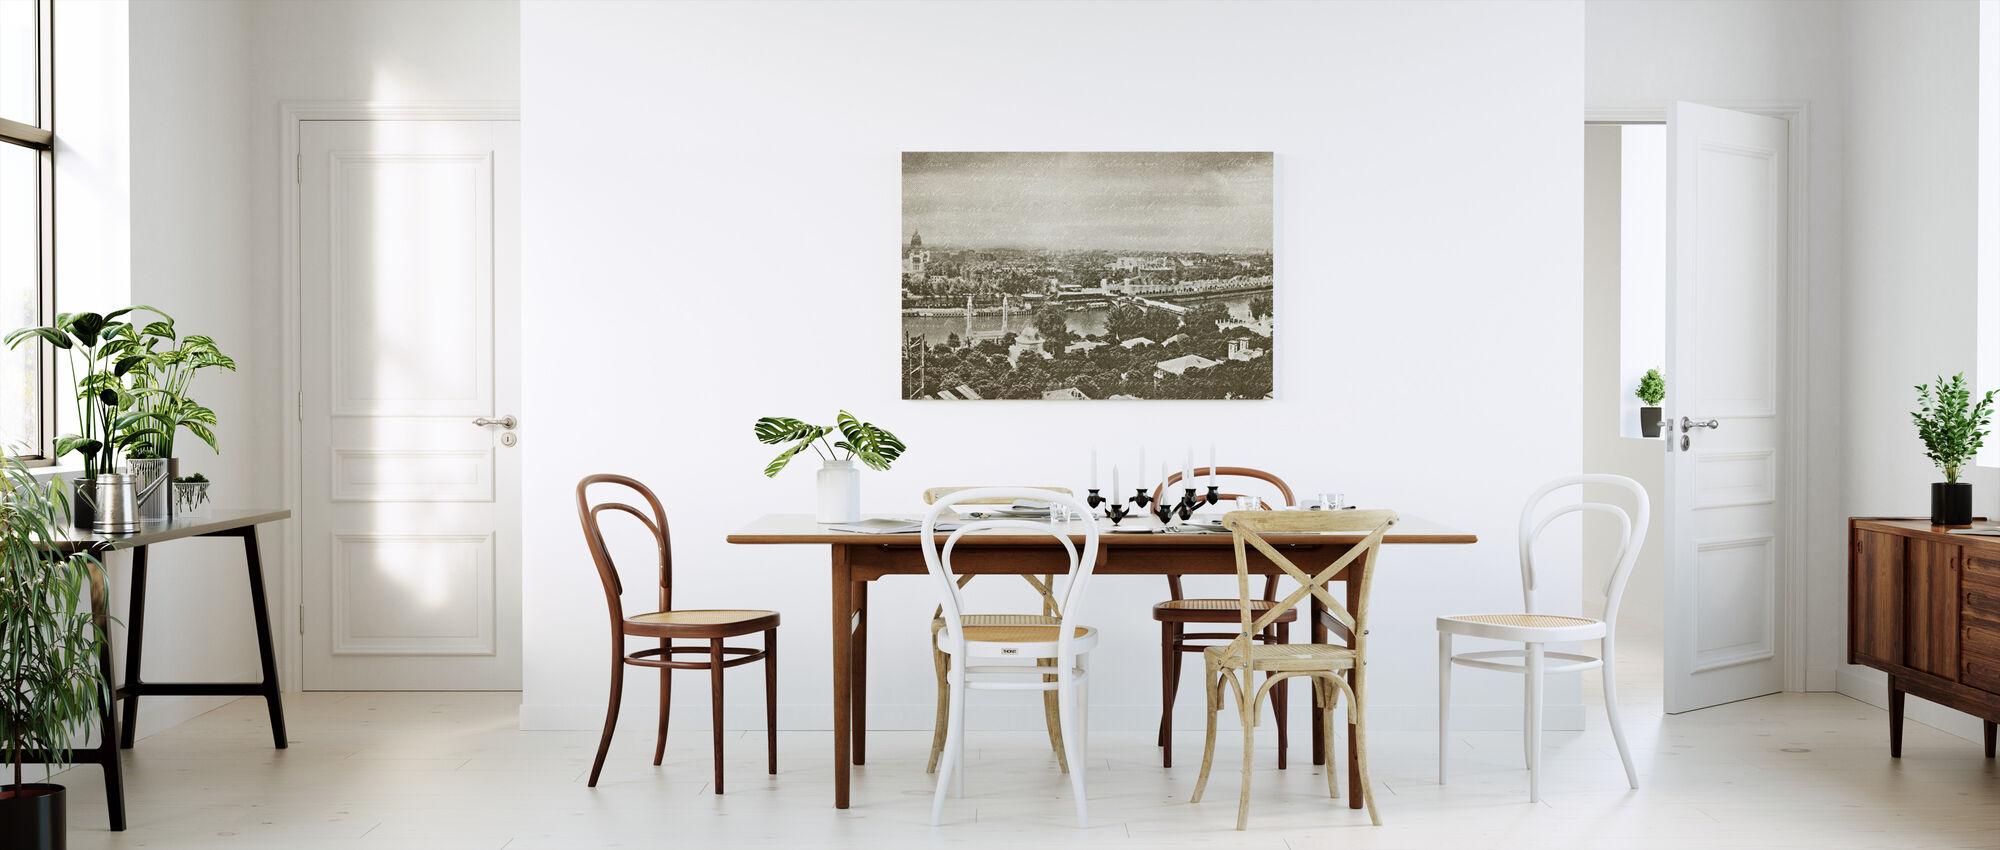 Paris Panorama - Canvas print - Kitchen